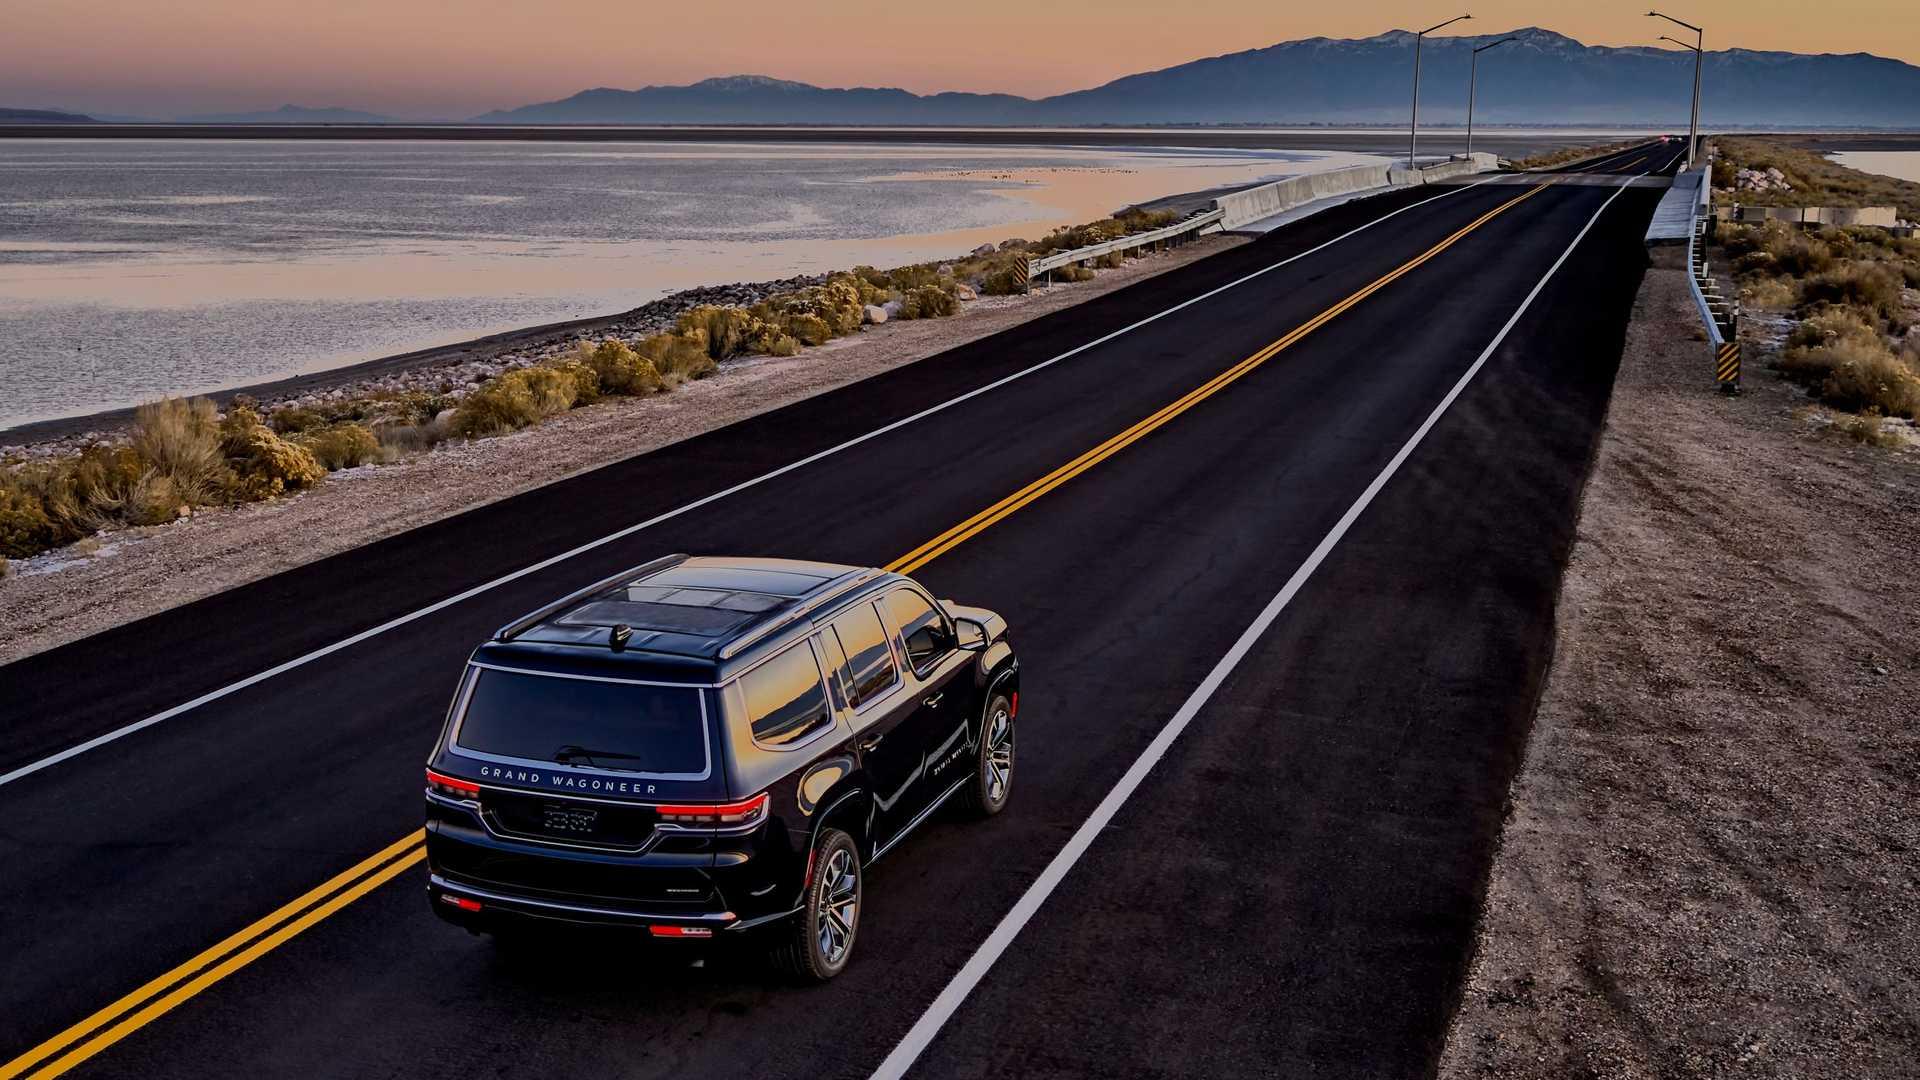 2022-jeep-grand-wagoneer-exterior-rear-quarter-10